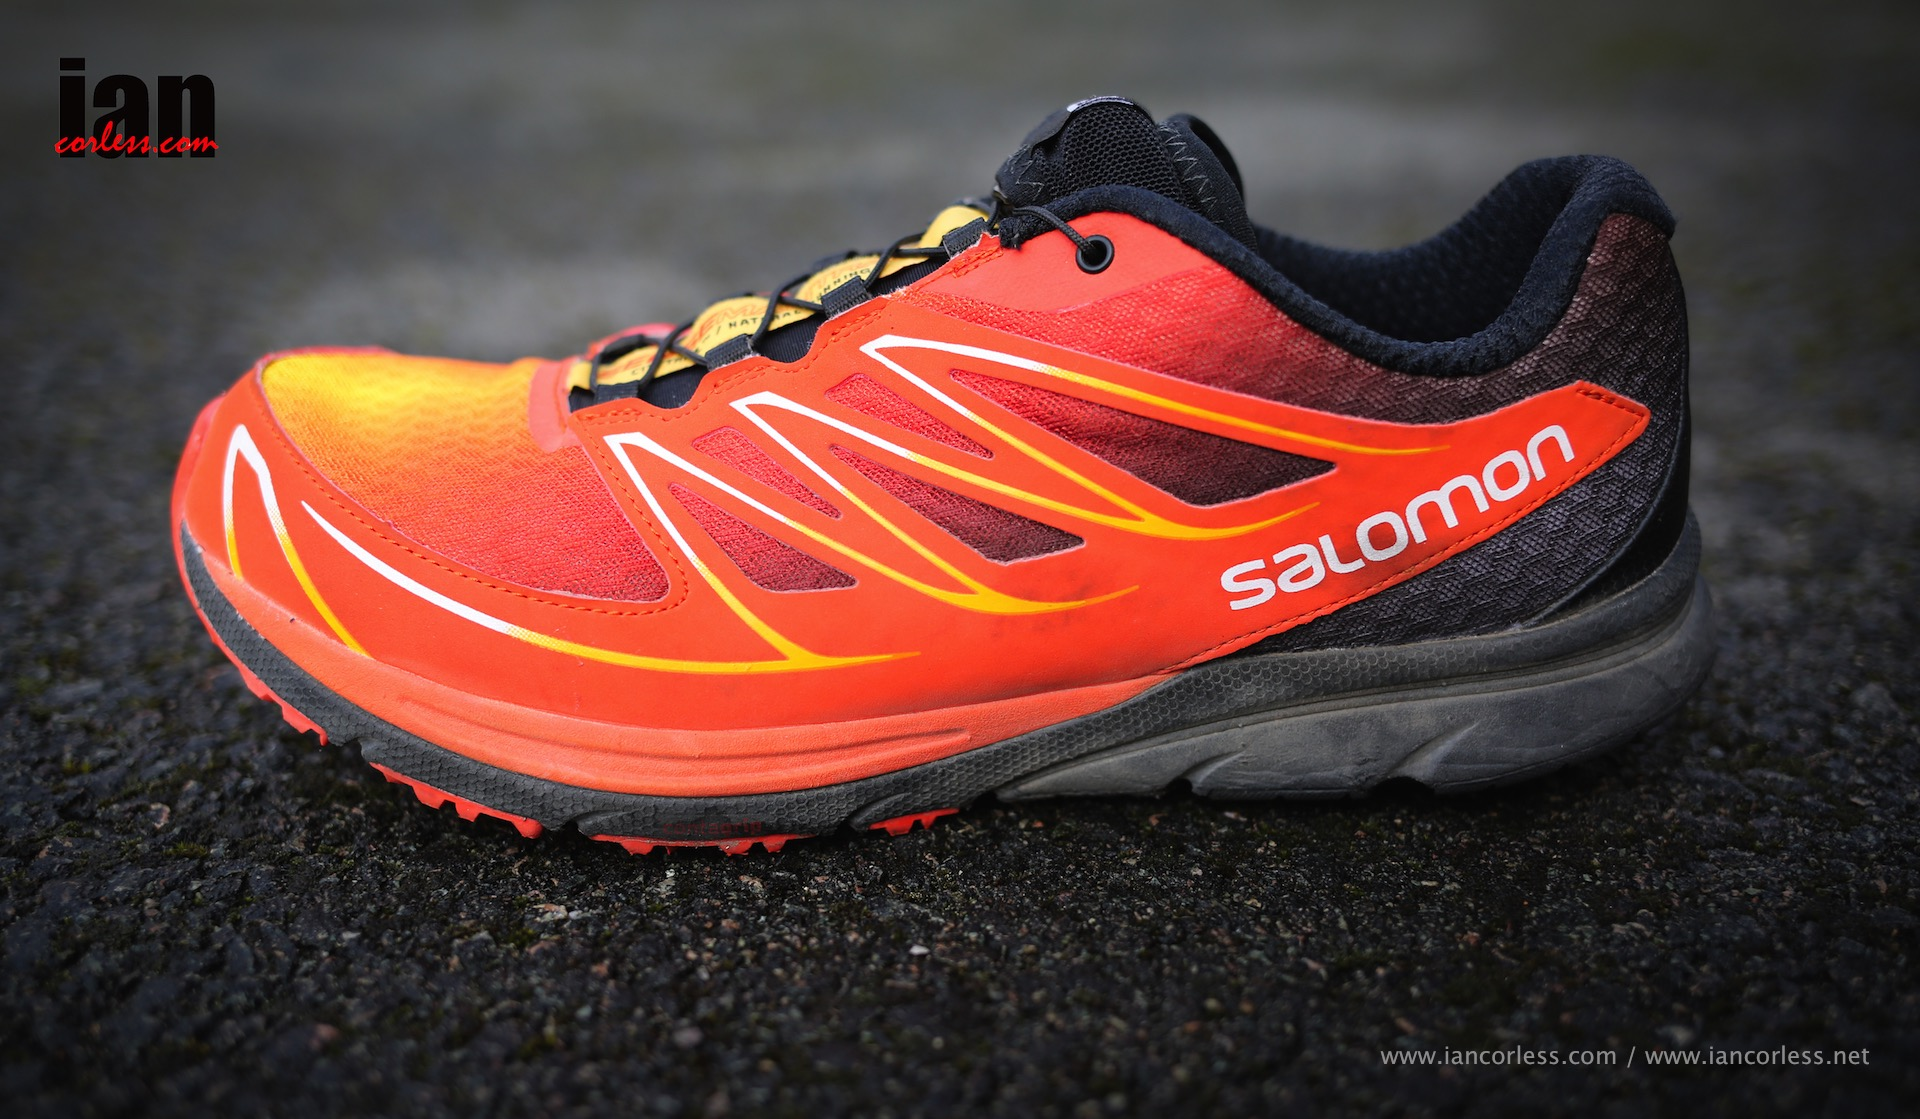 3c8c47c5b99a Salomon Sense Mantra 3 – Review